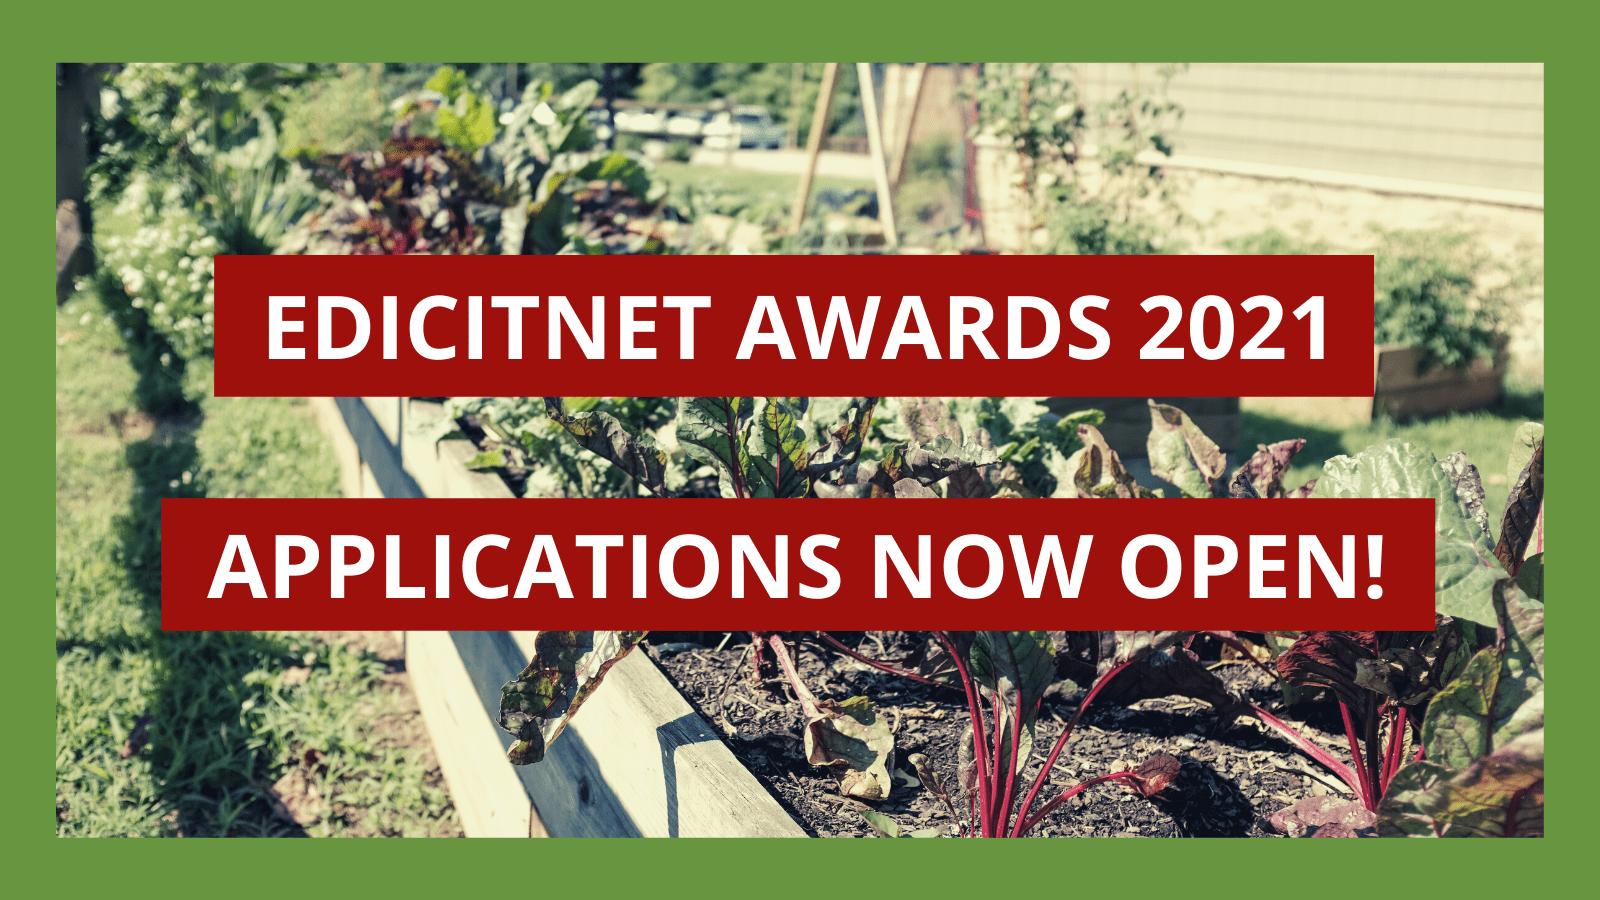 EDICITNET AWARDS 2021(2)-min